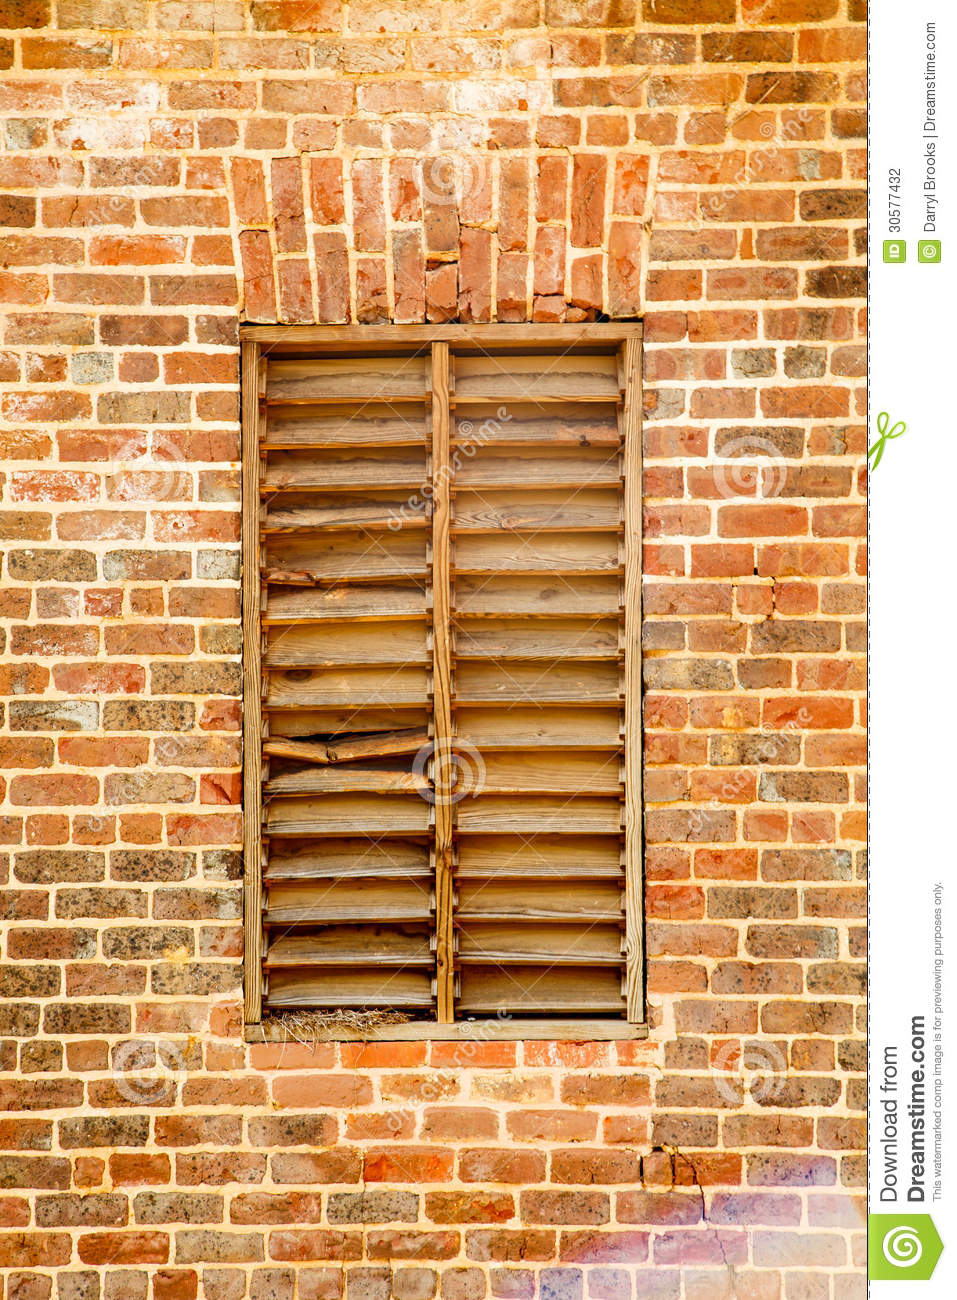 Old Wood Slat Window In Brick Wall Stock Photography.